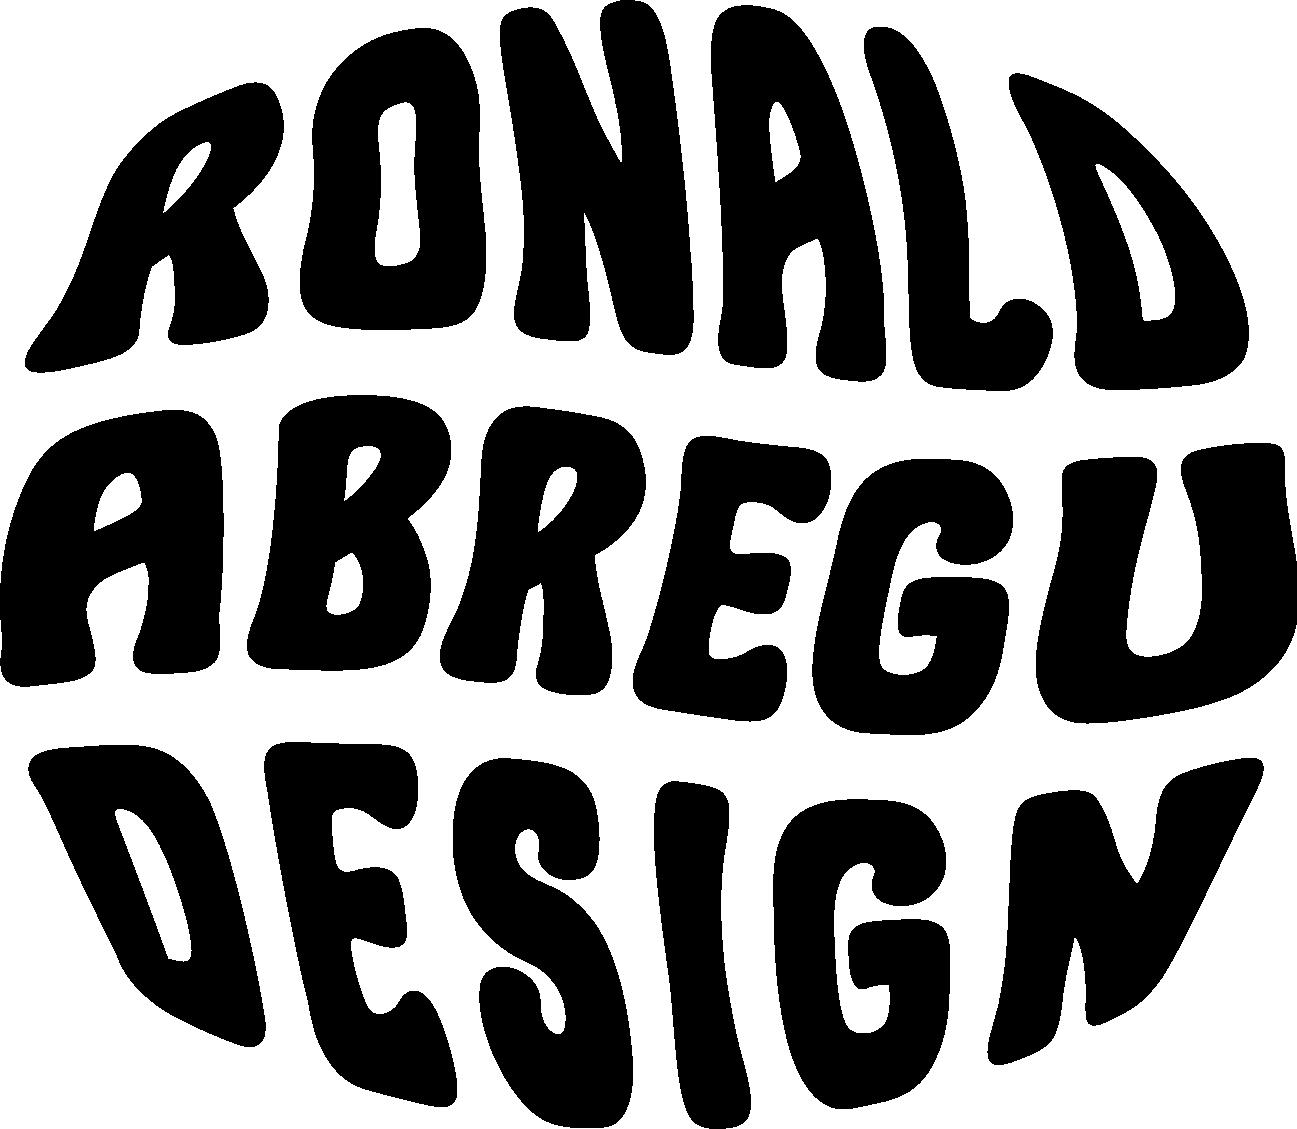 RONALD ABREGU DESIGN